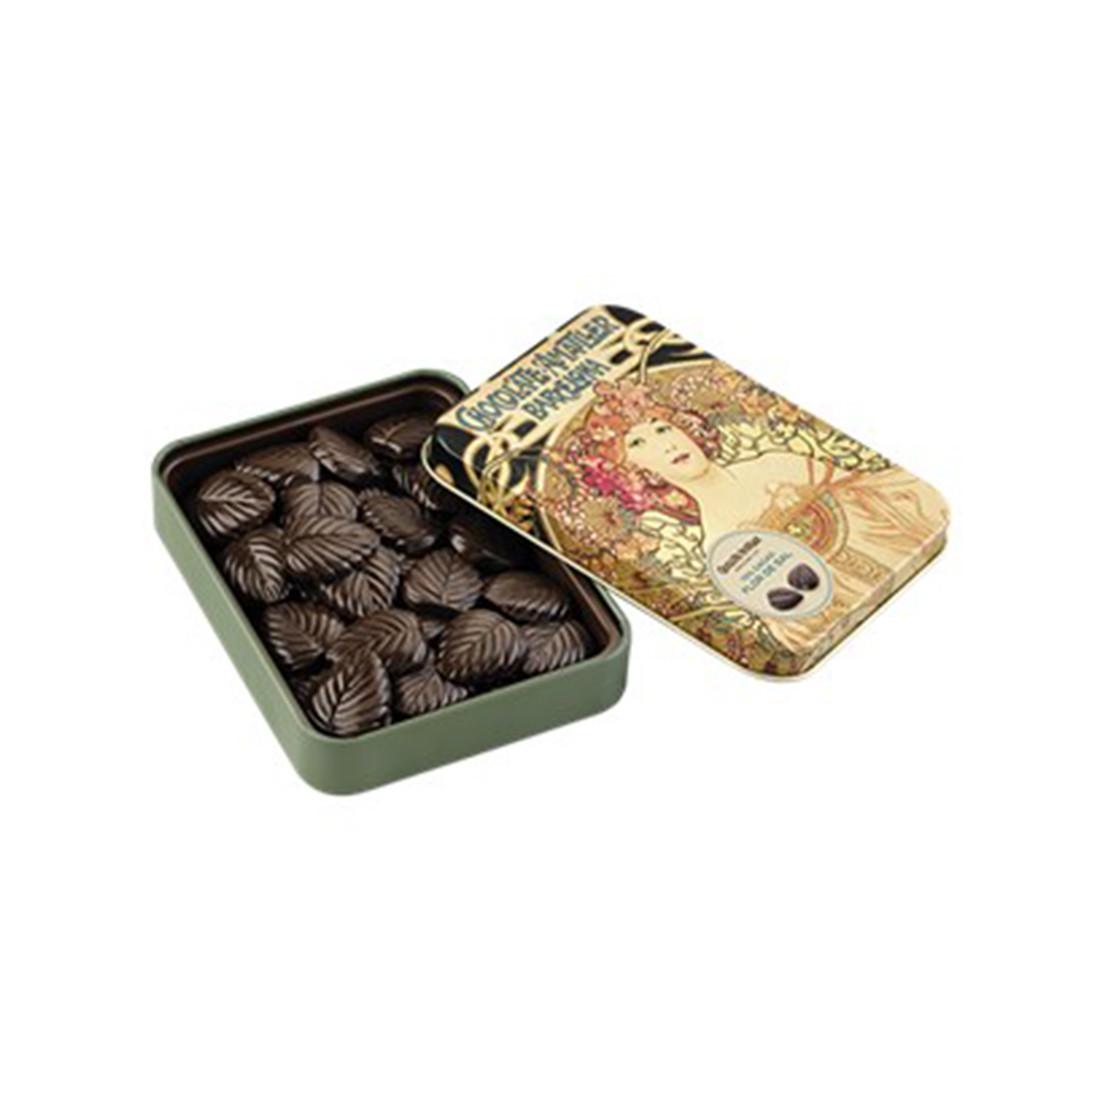 Image of   70% Mørk chokolade m salt i dåse - 60 gram